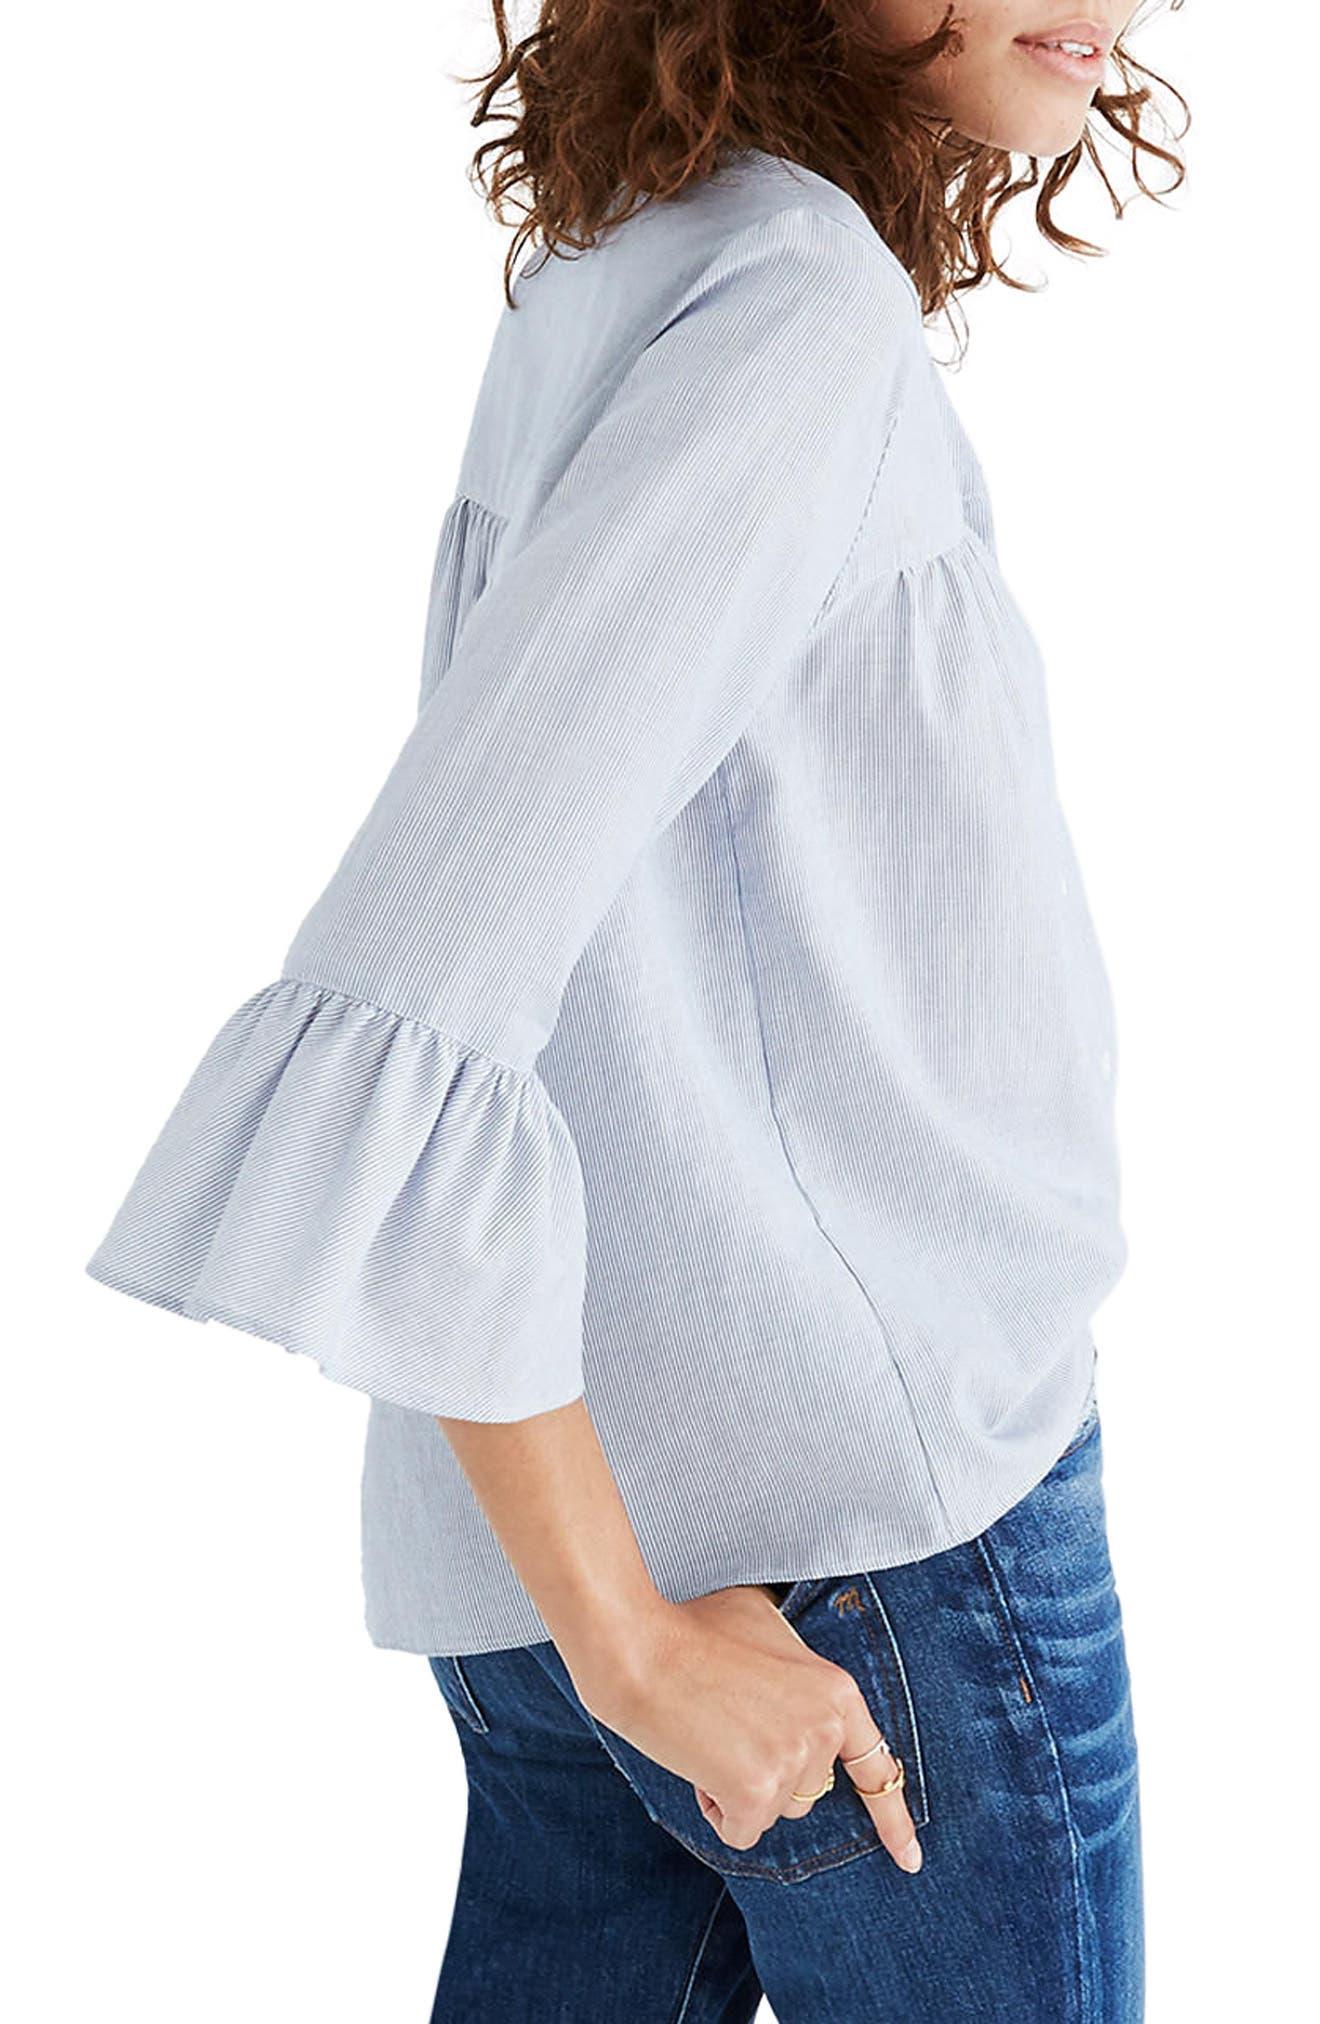 Veranda Bell Sleeve Shirt,                             Alternate thumbnail 2, color,                             Royal Blue